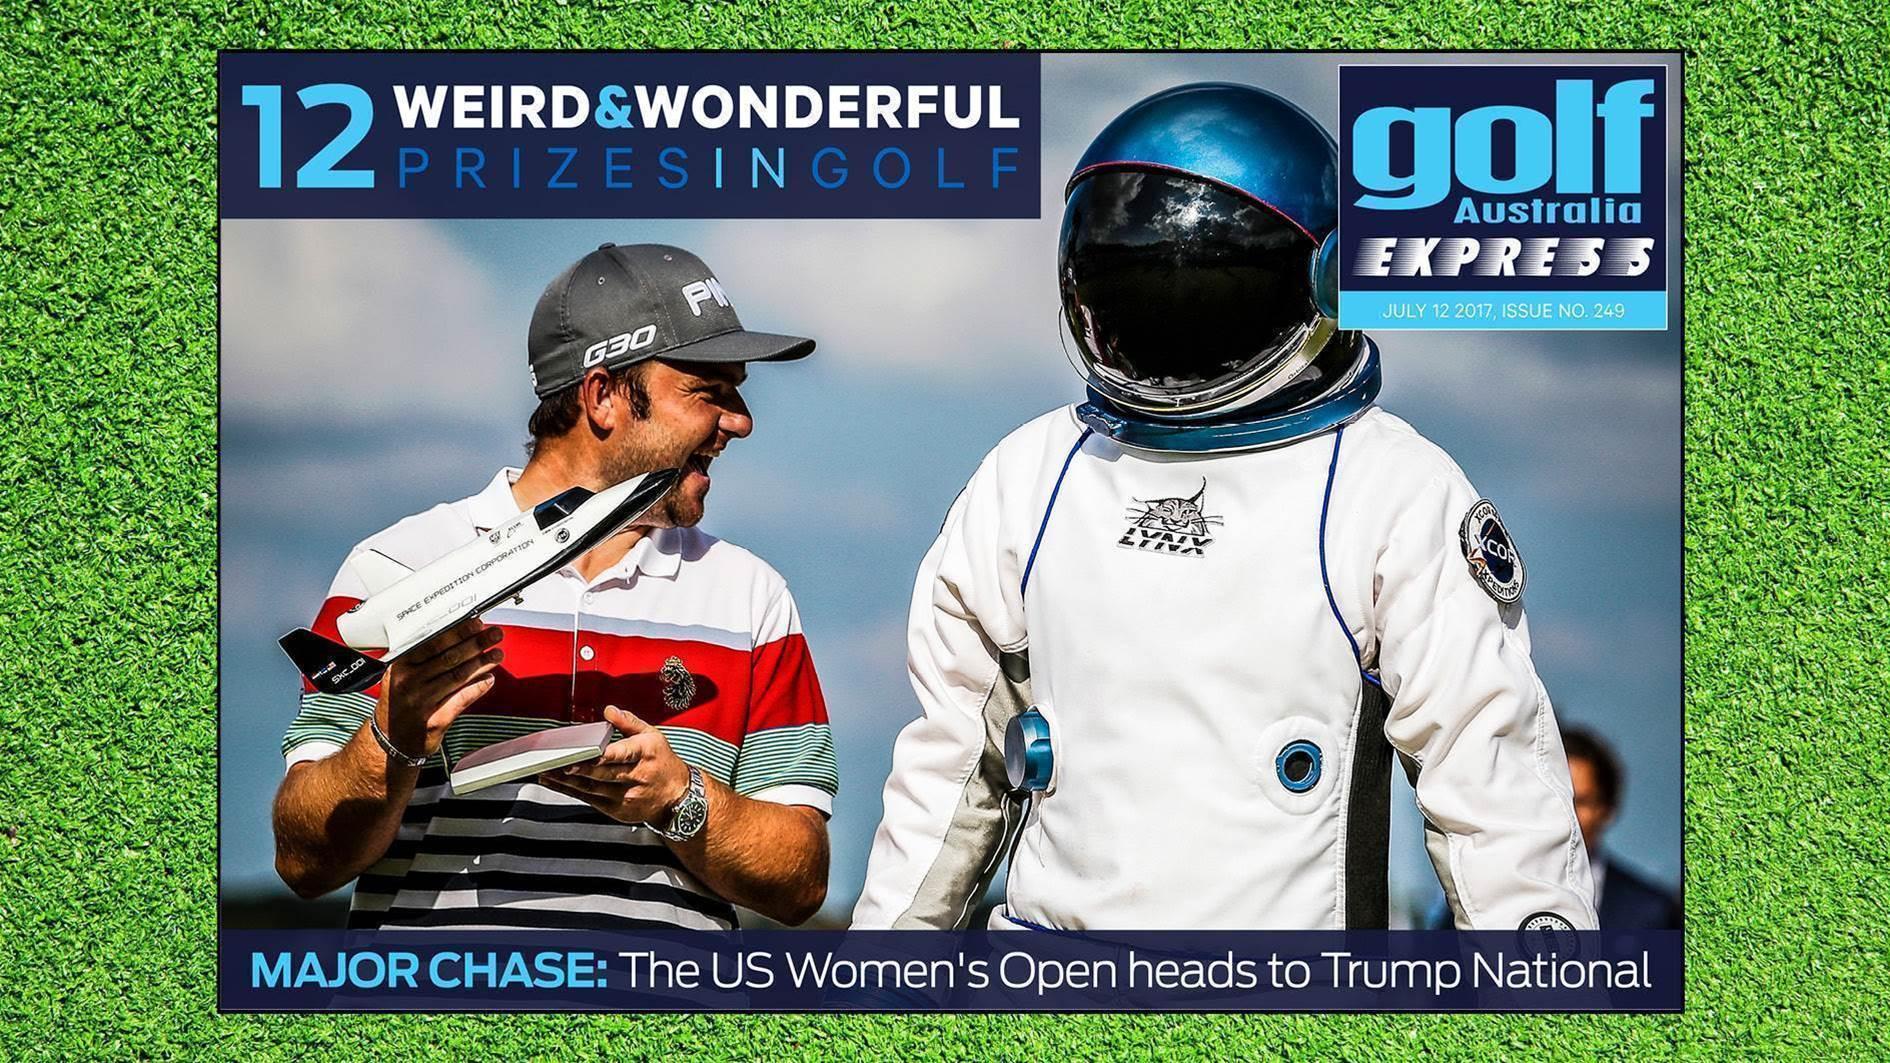 GA Express #249: Golf's weirdest & most wonderful prizes